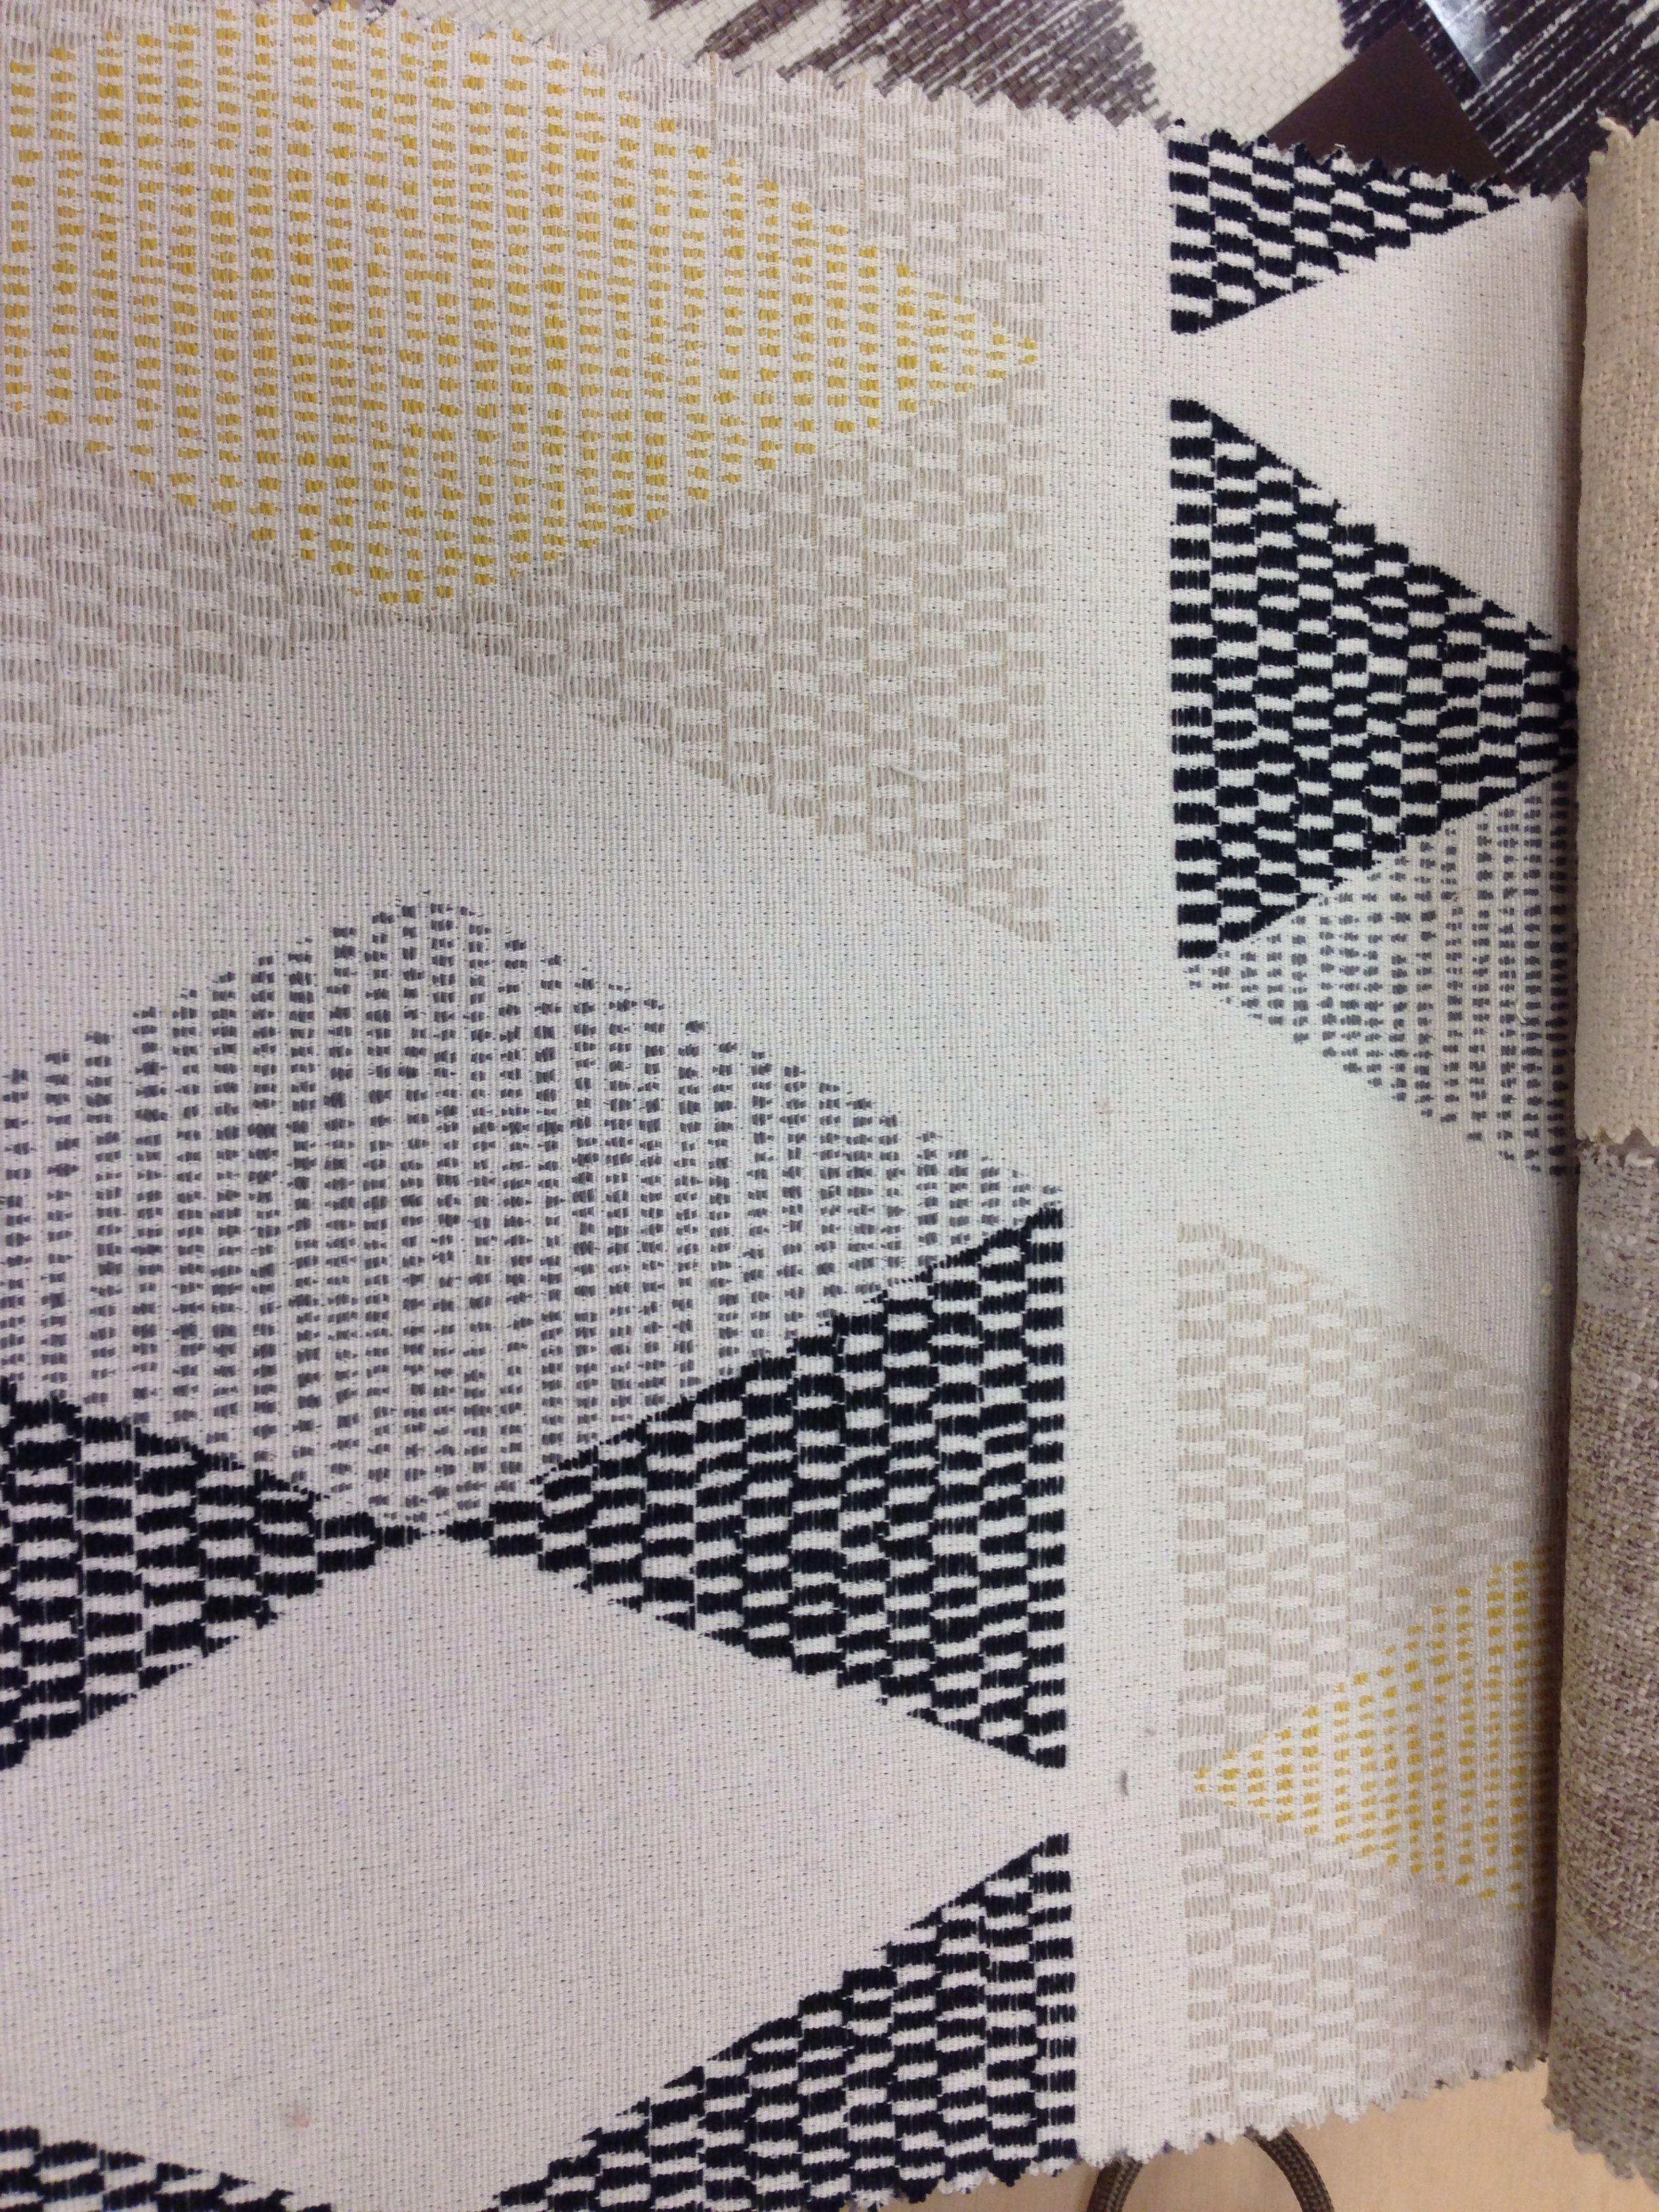 Calico corners calico corners fabric calico